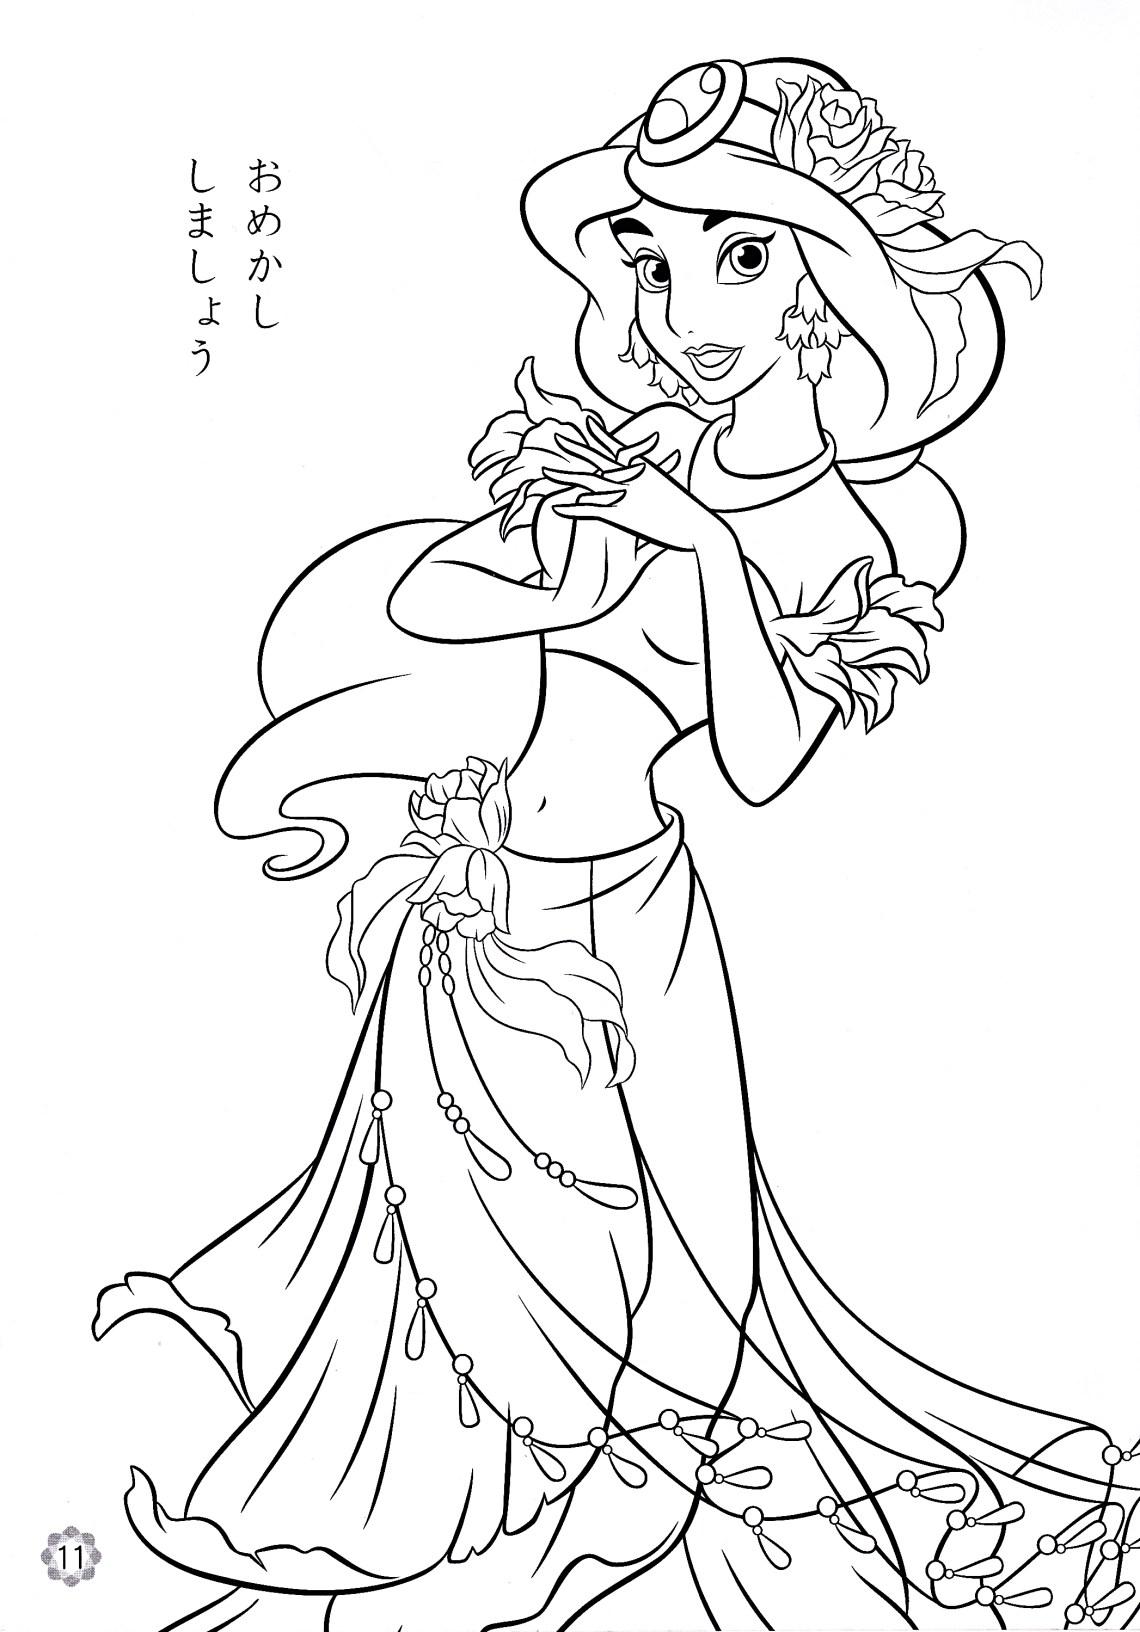 Disney Princess Coloring Pages - Princess Jasmine - Disney ... | disney princess jasmine colouring pages